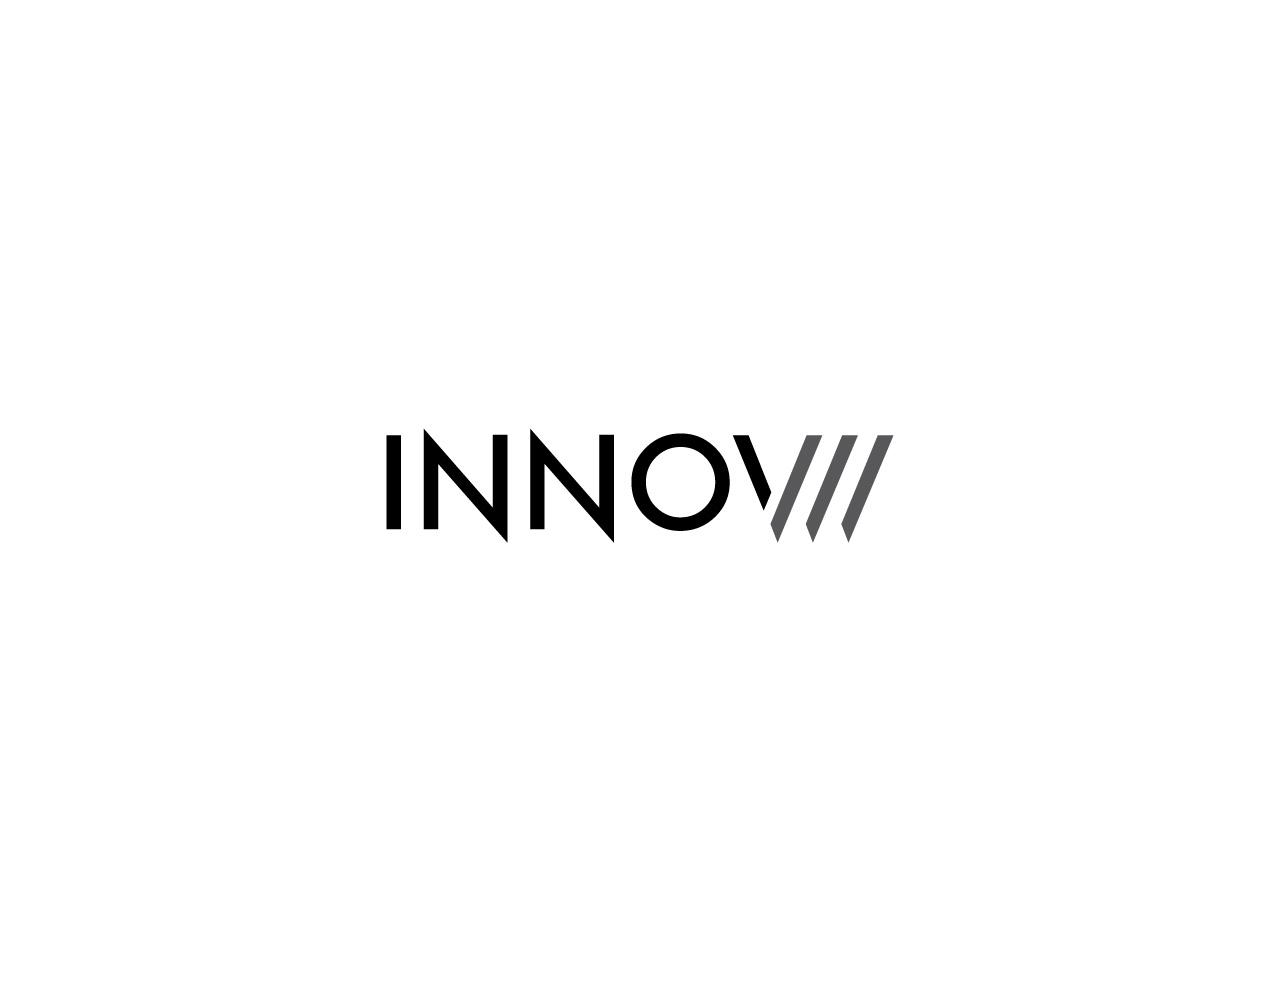 Innovate Jessica Rycheal